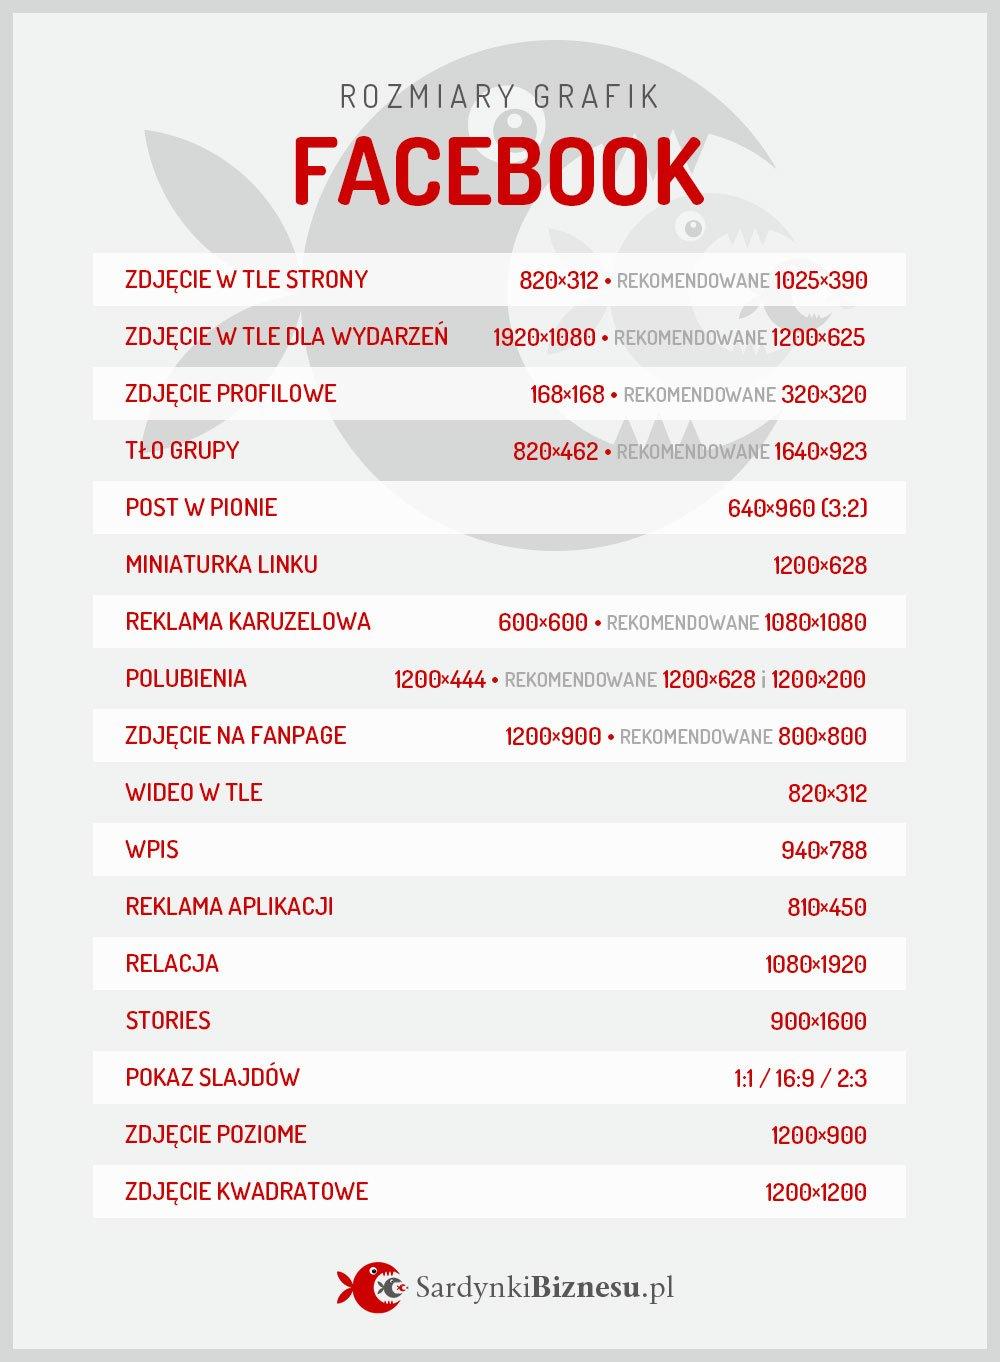 Lista rozmiarów grafik na portalu Facebook.